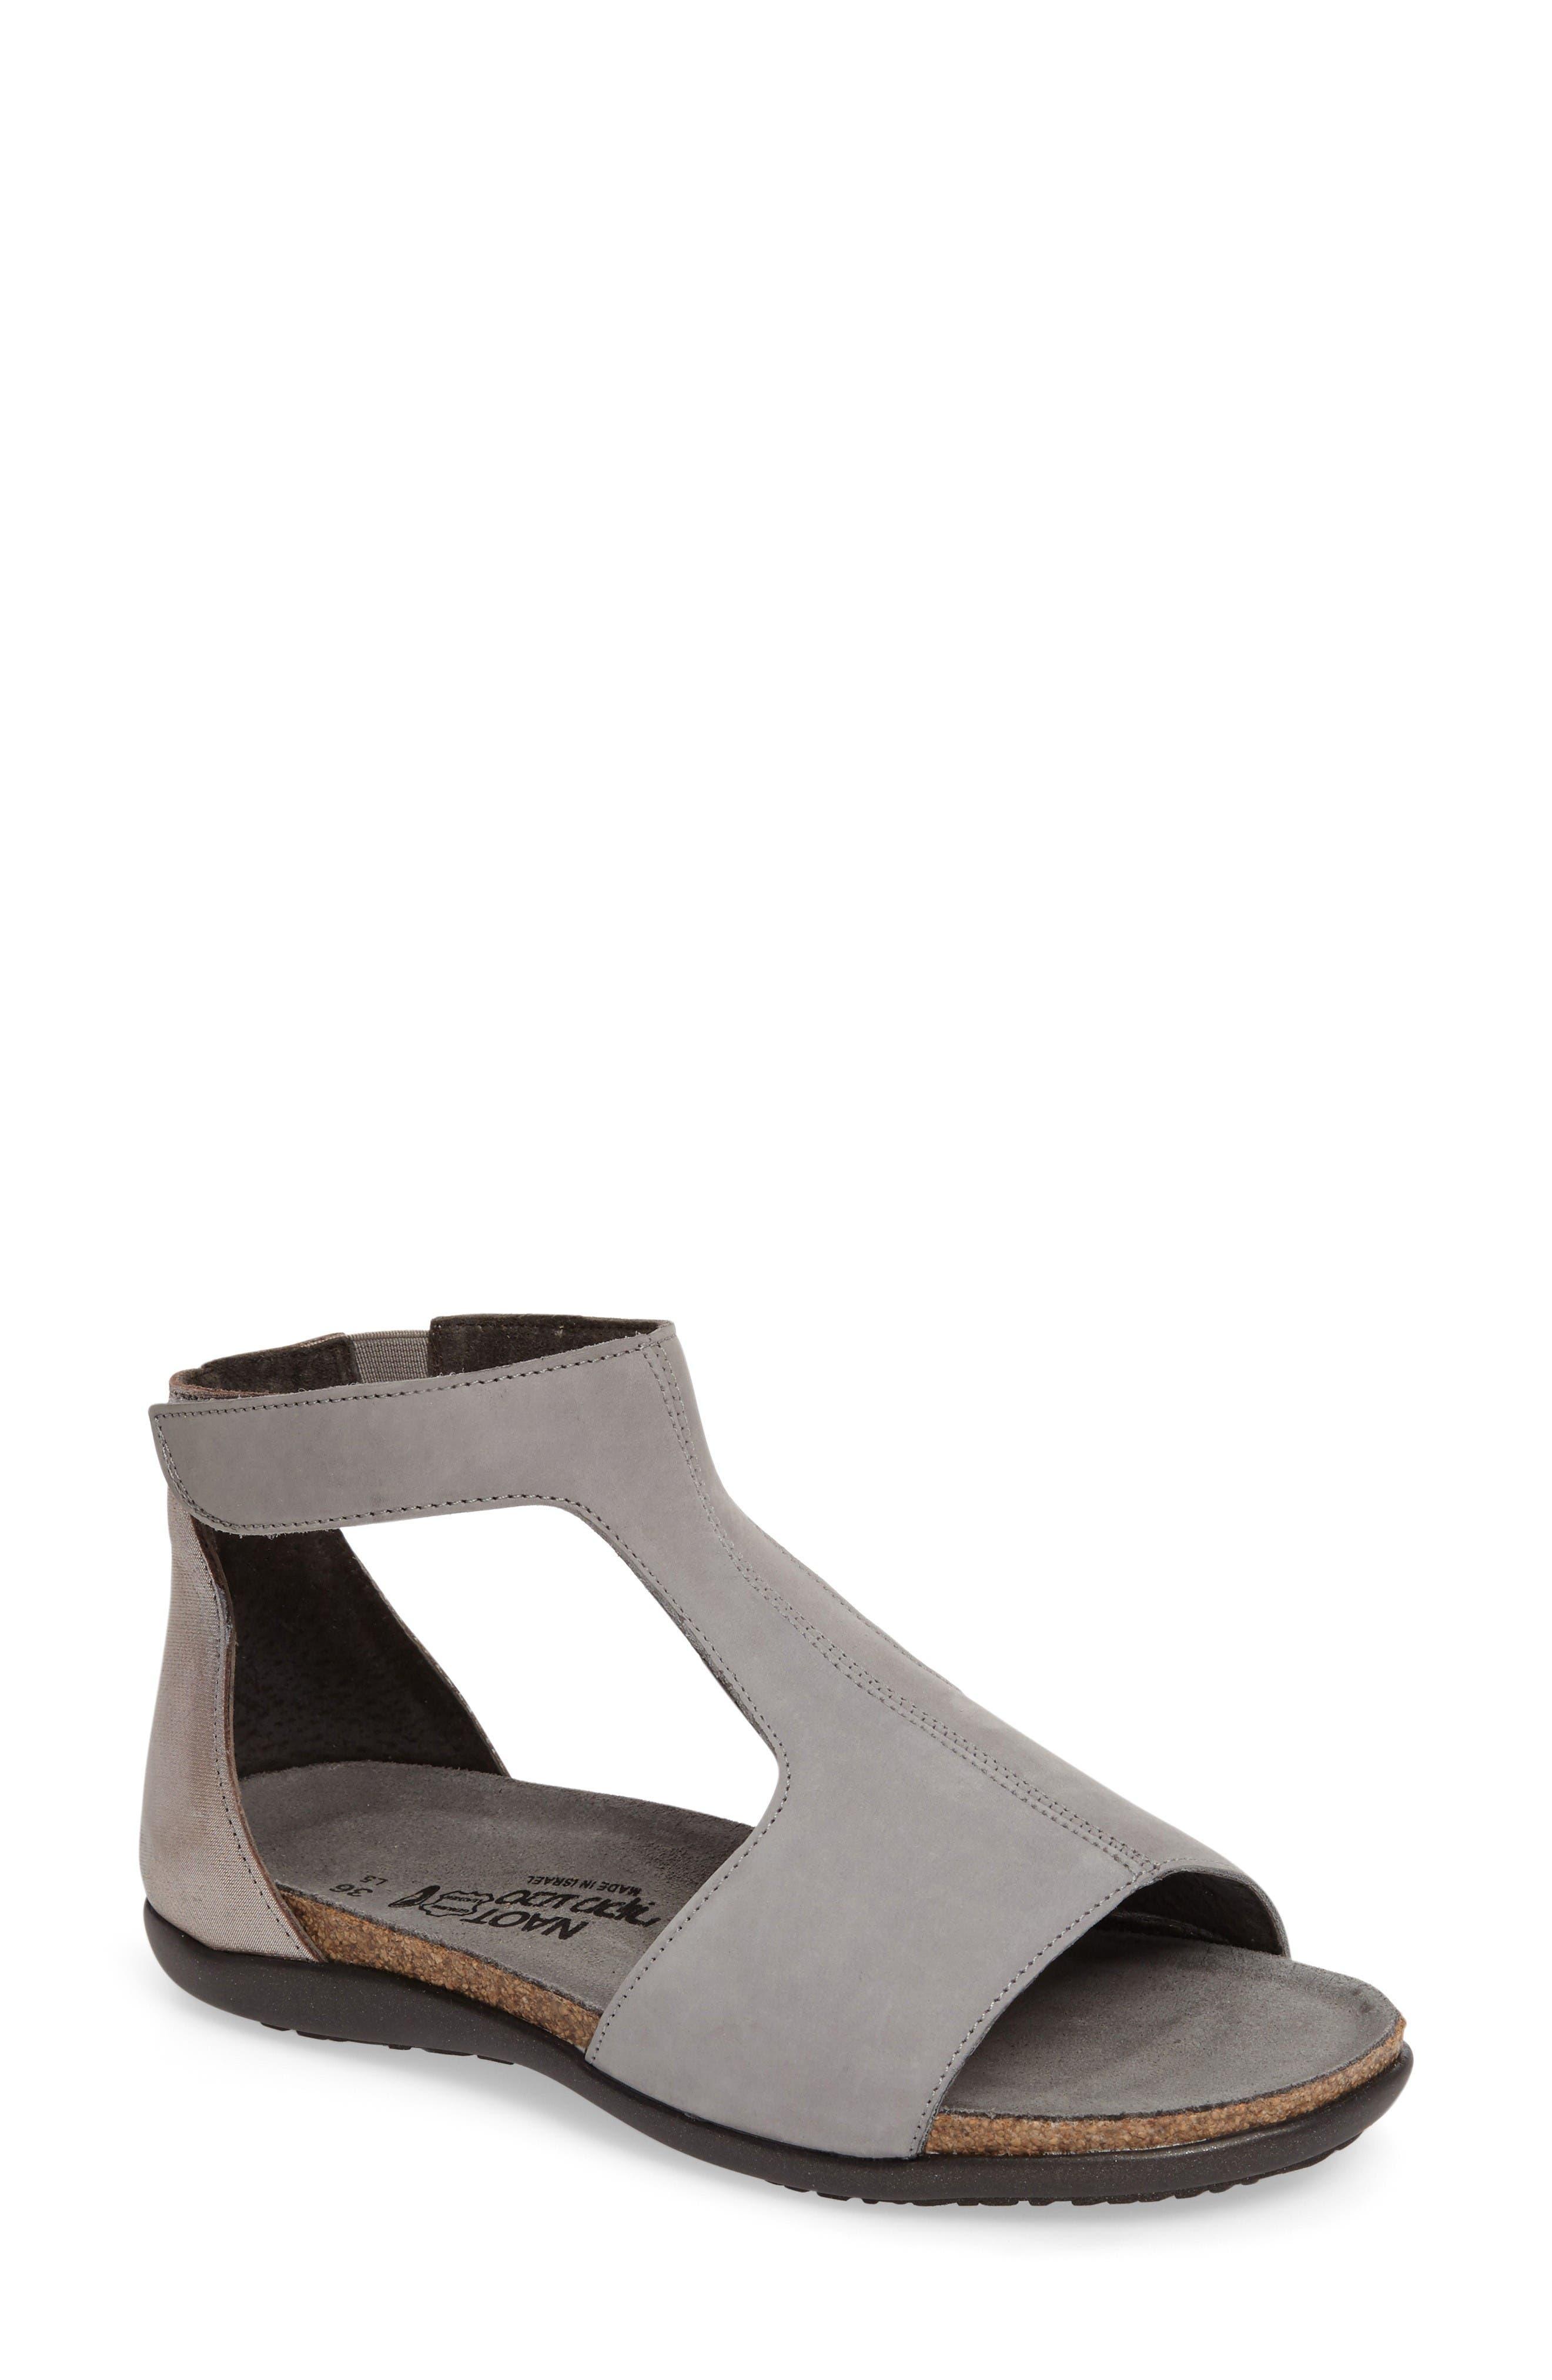 Nala Sandal,                             Main thumbnail 1, color,                             Grey/ Silver Nubuck Leather